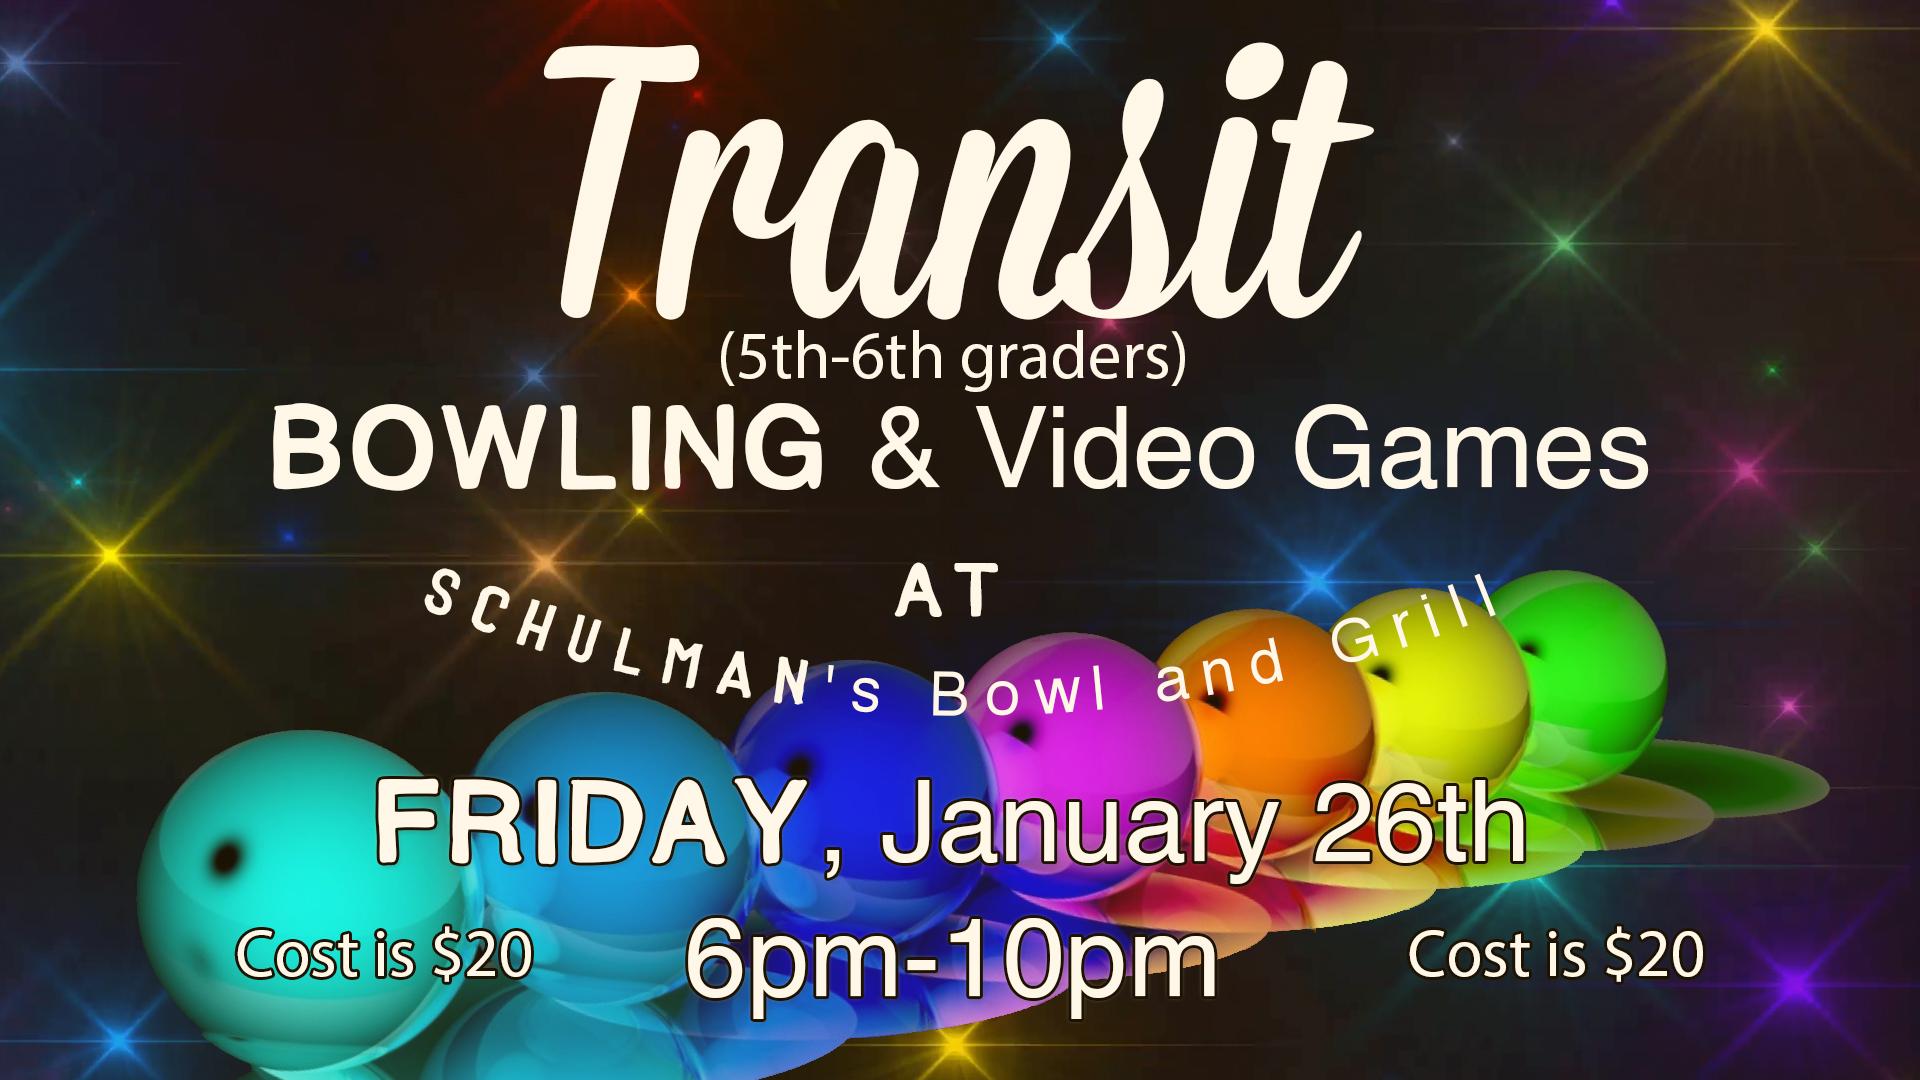 Transit Bowling and Video Games.jpg